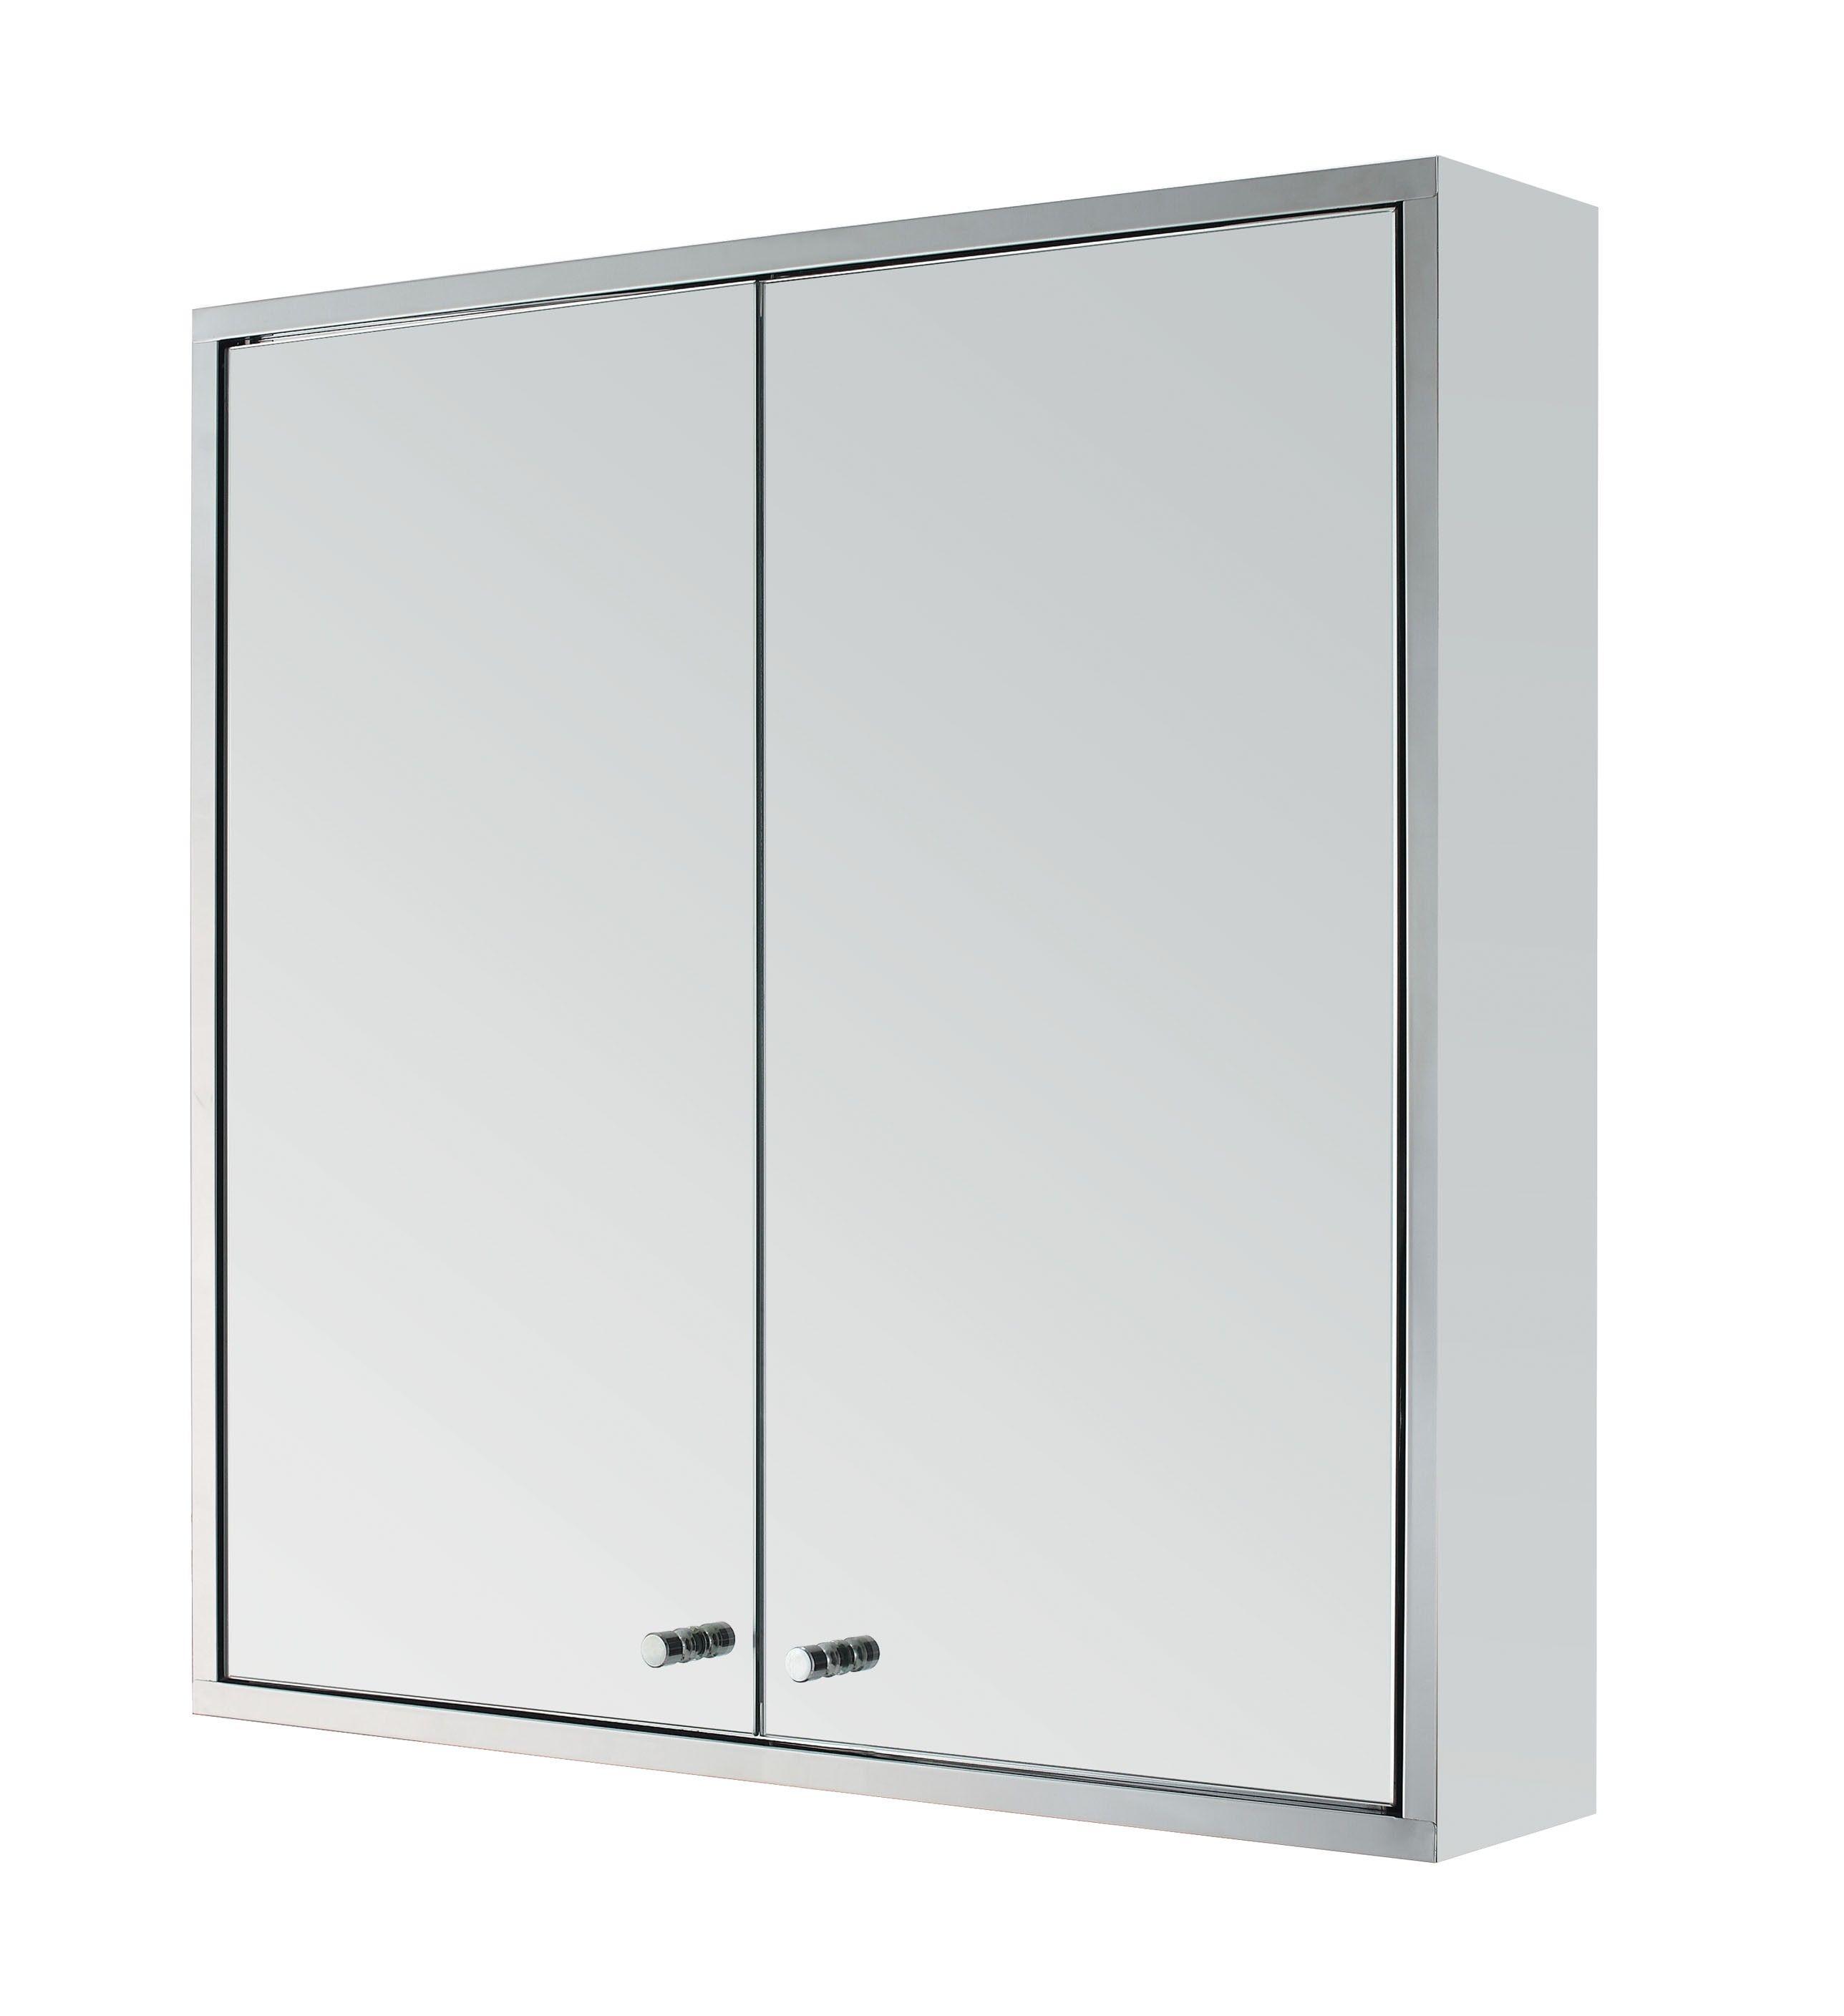 stainless steel double door wall mount bathroom cabinet storage from ...